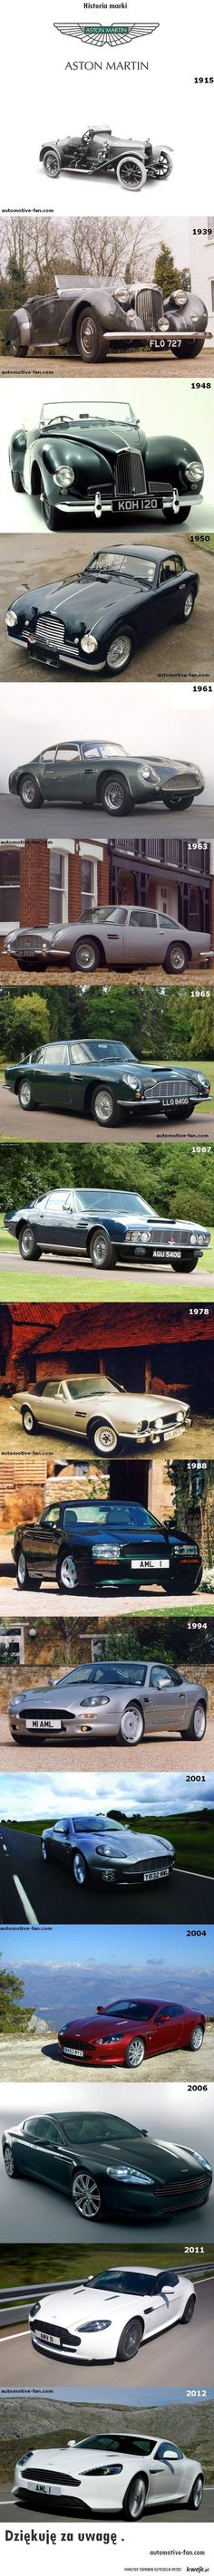 The history of Aston Martin